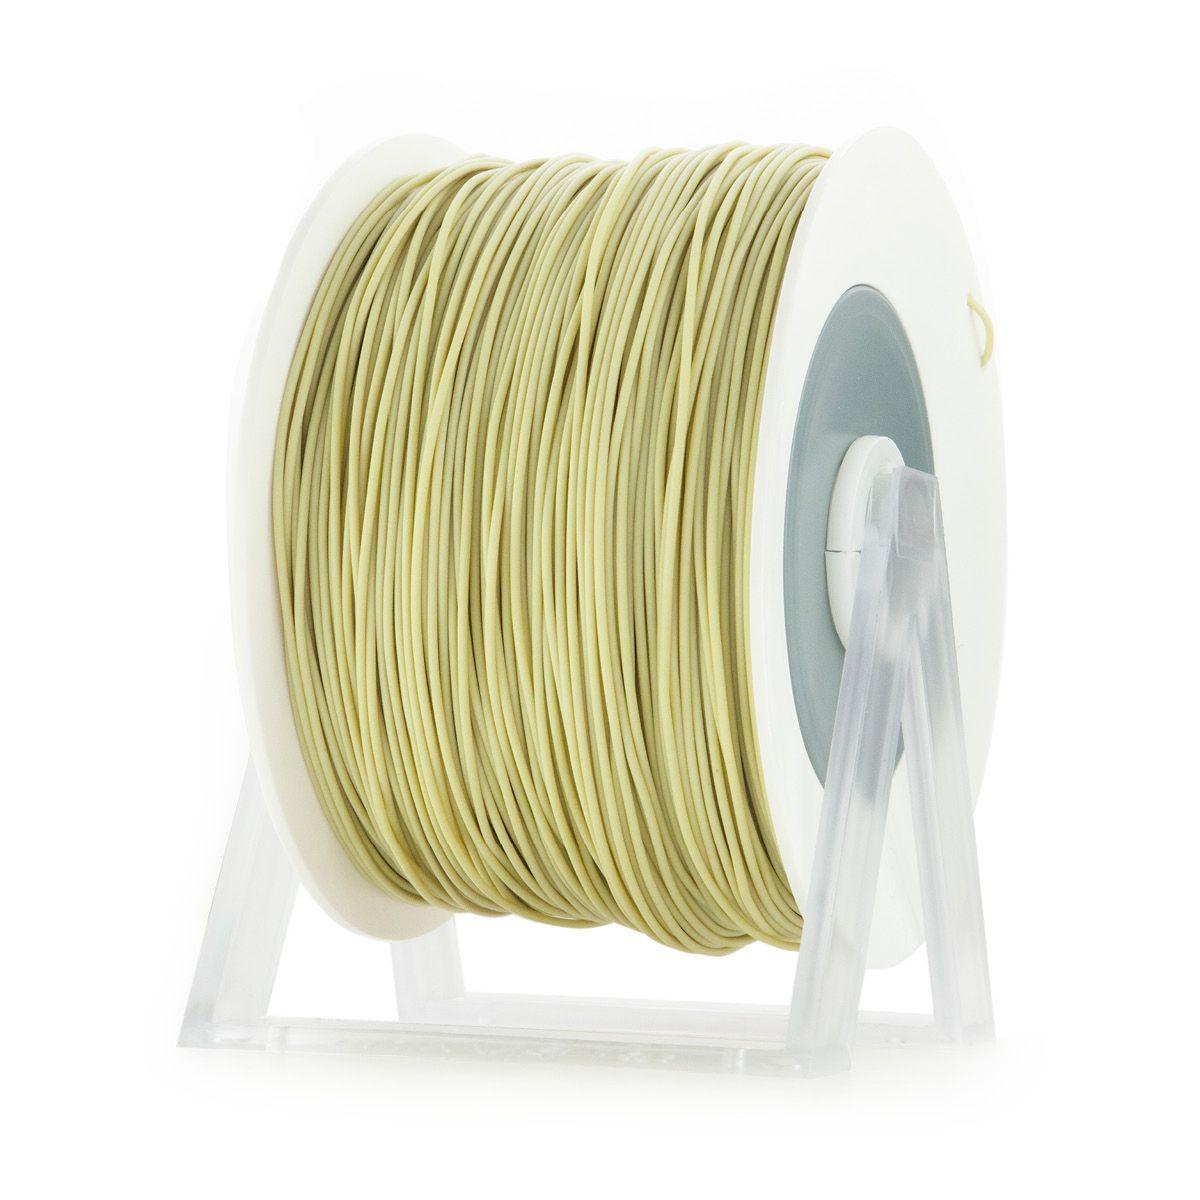 PLA Filament | Color: Metallic Sand Yellow